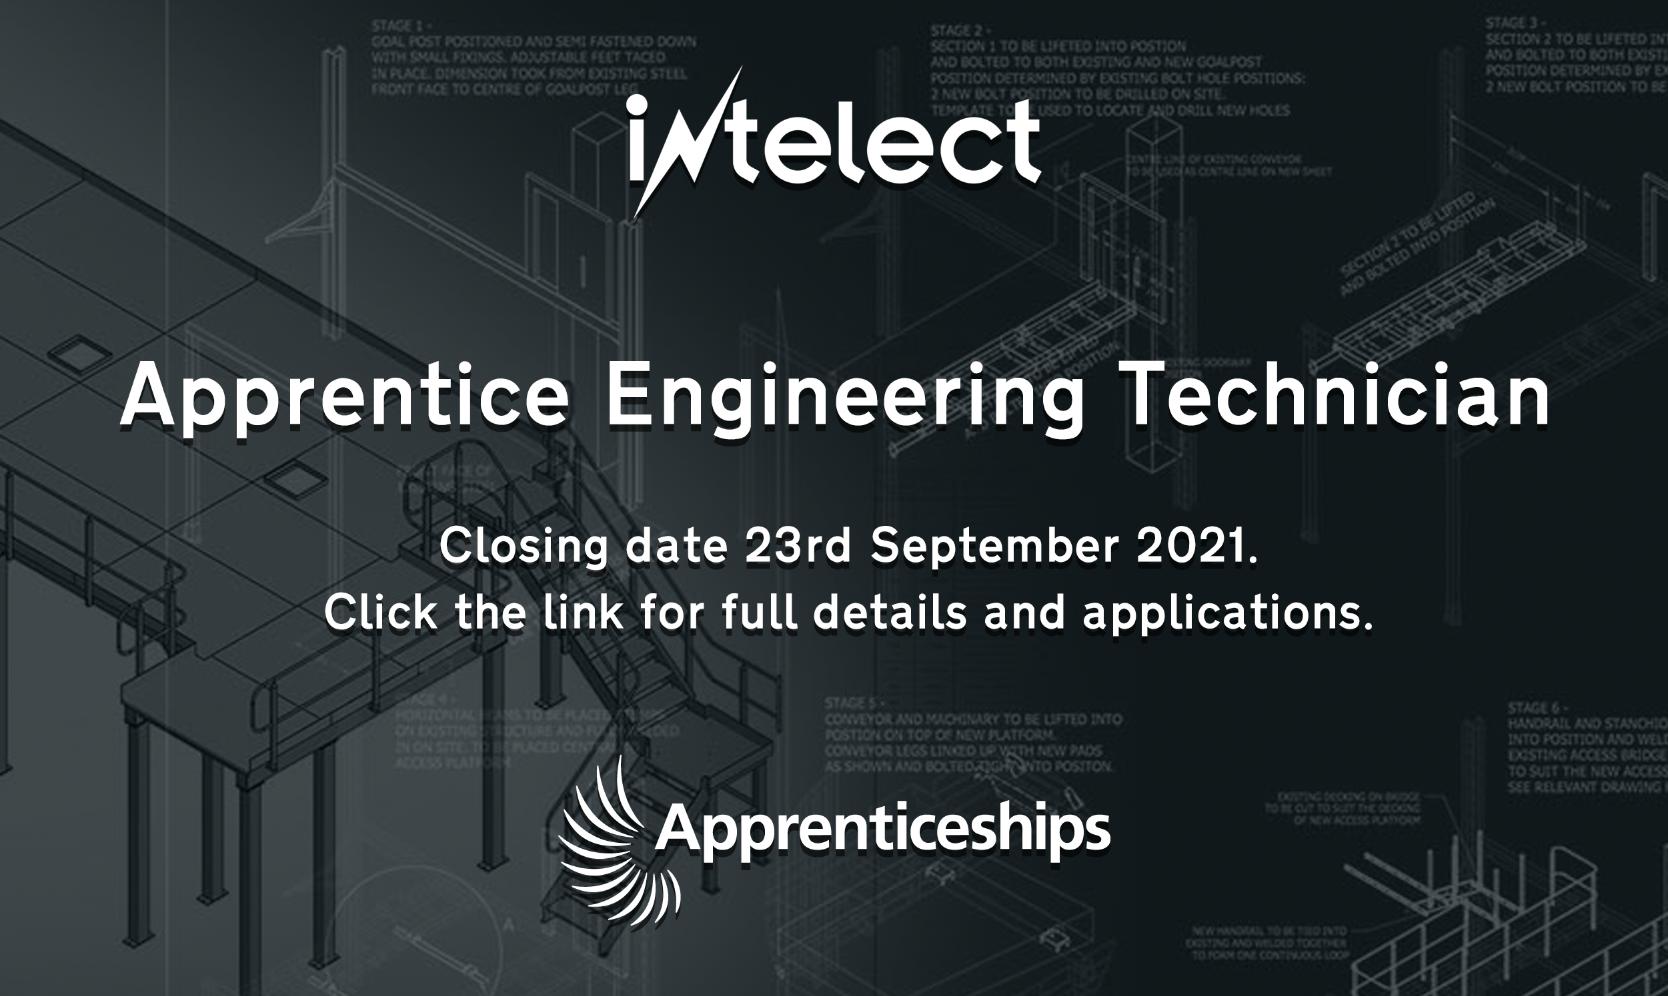 Intelect Apprenticeships